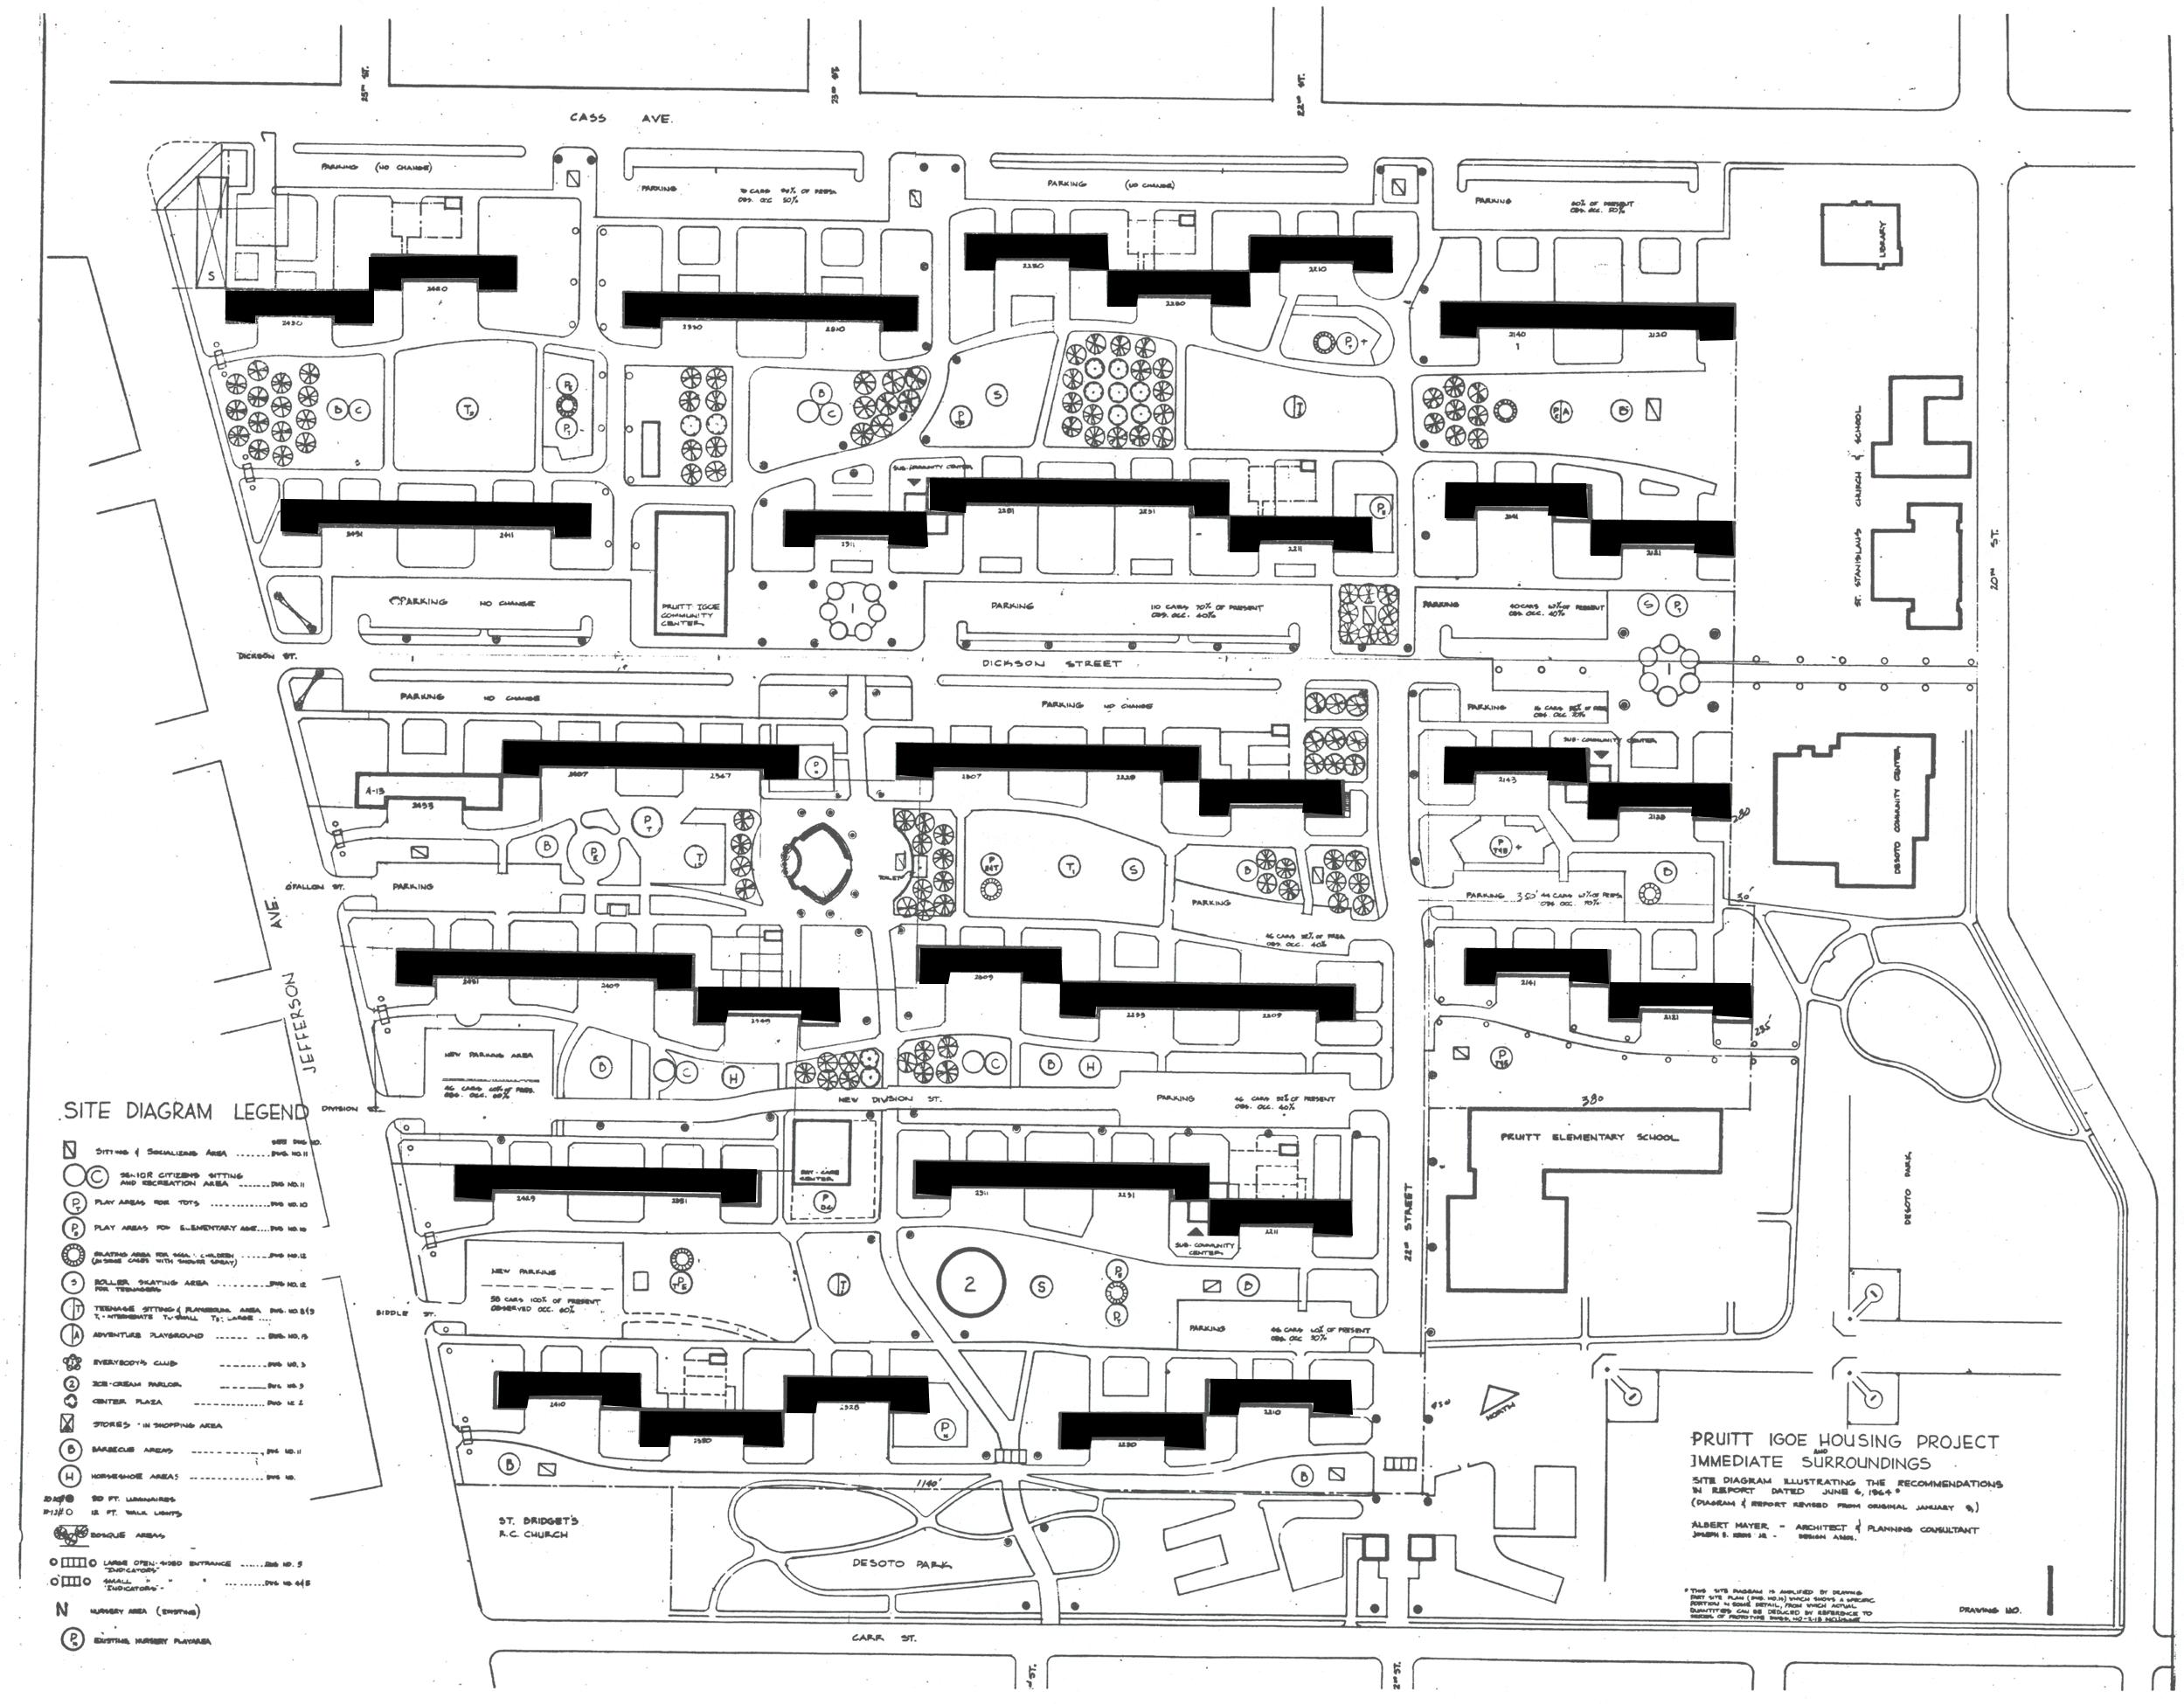 2499x1950 Typology 3 Radiant City Housing Design Primer